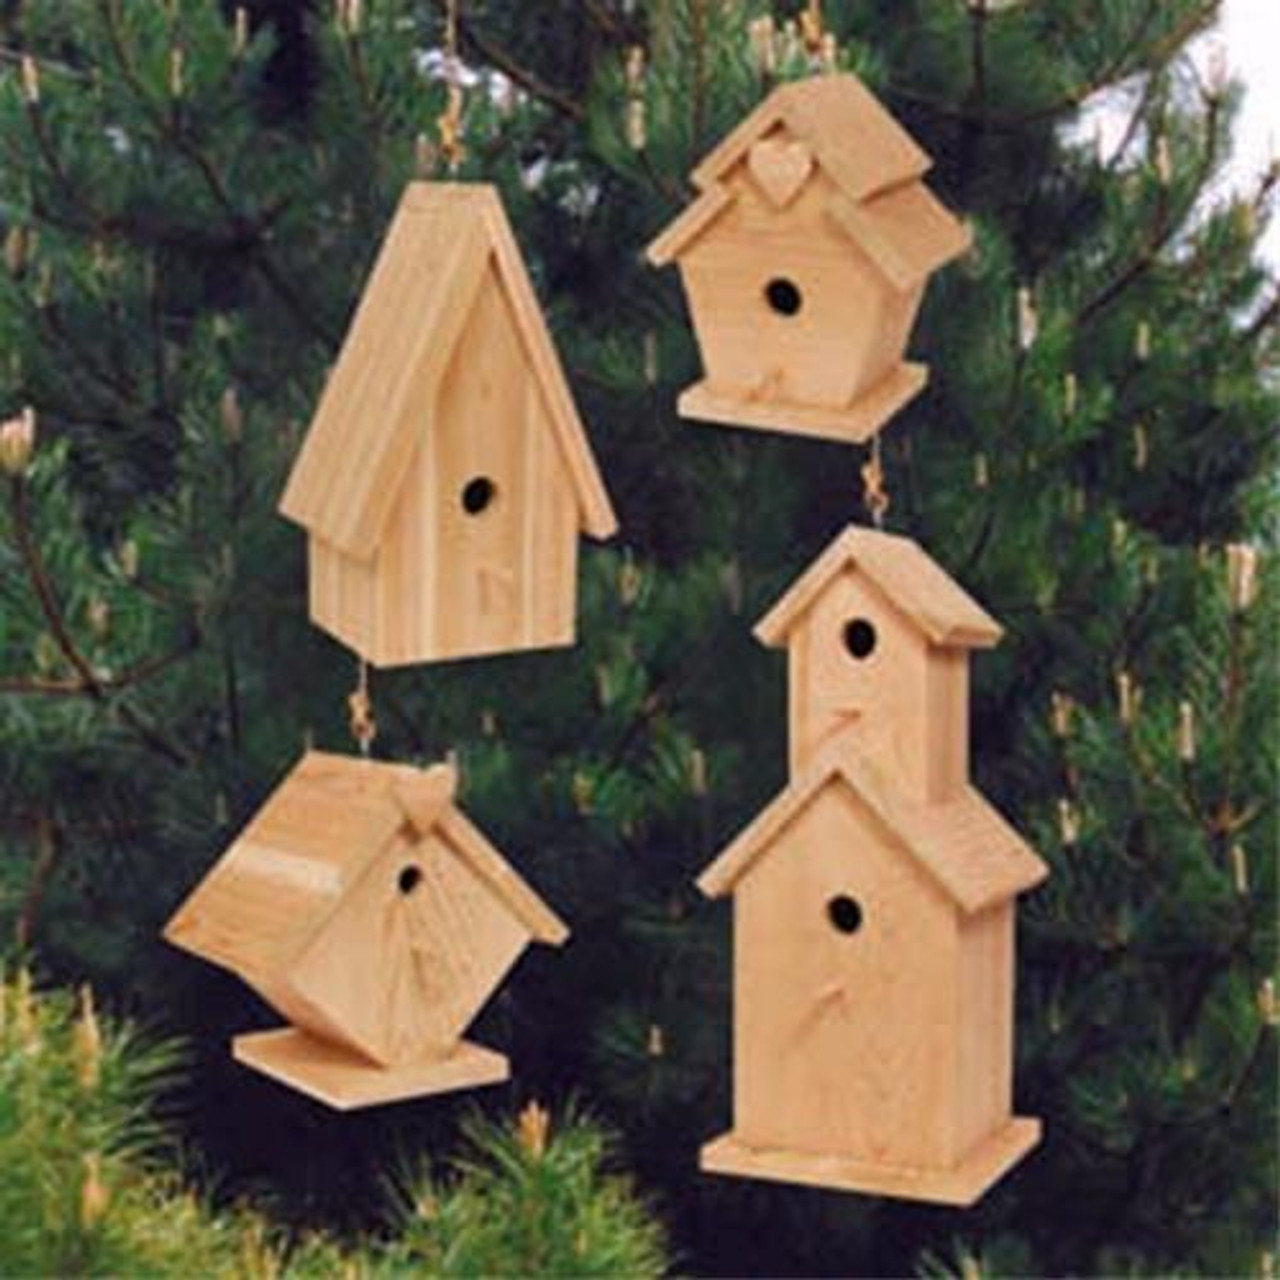 SherwoodBirdhouse Village Woodworking Plan.